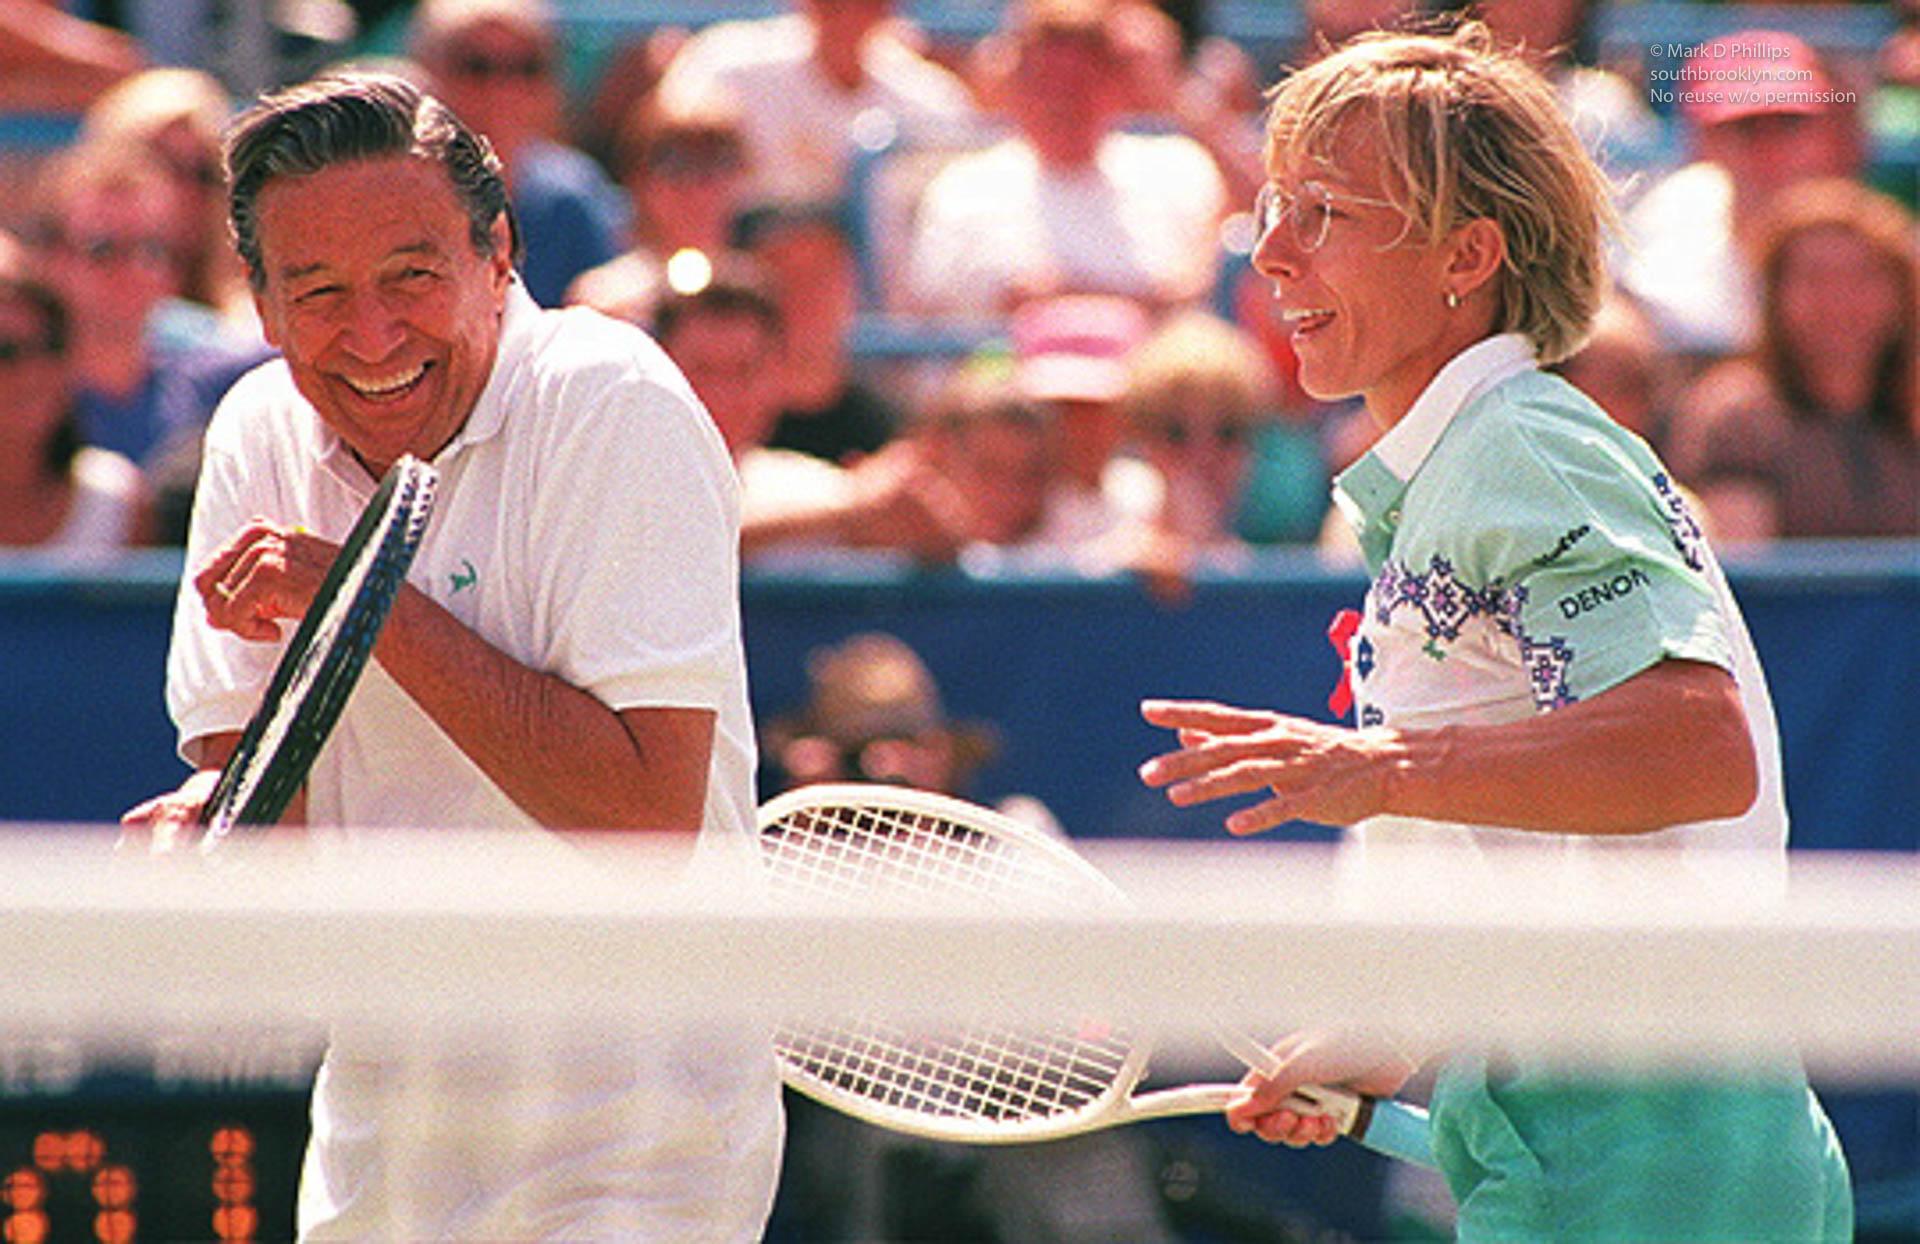 Martina Navritilova and Mike Wallace at Arthur Ashe Day at the US Open